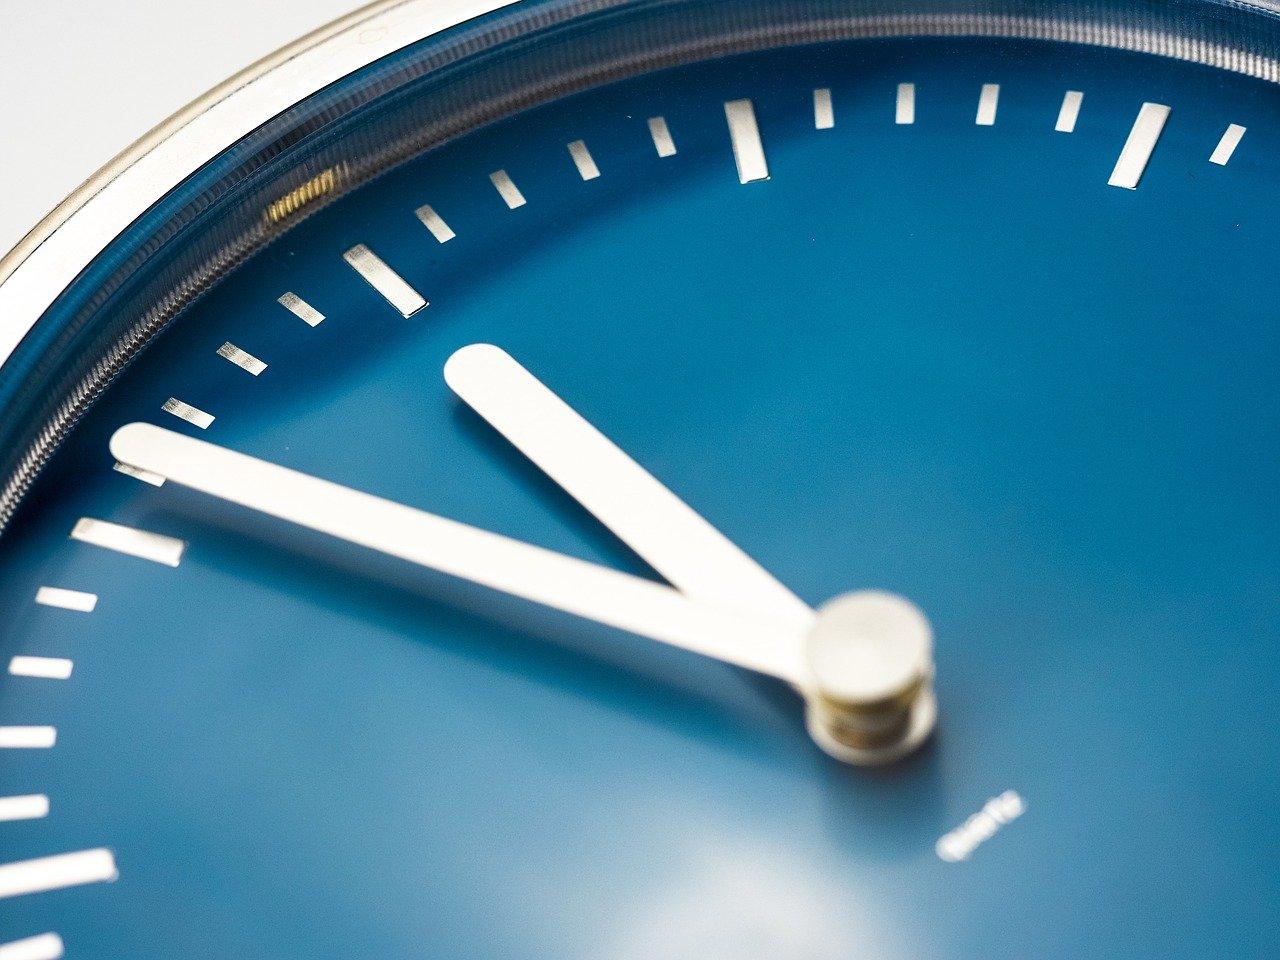 Close up image of a blue clock